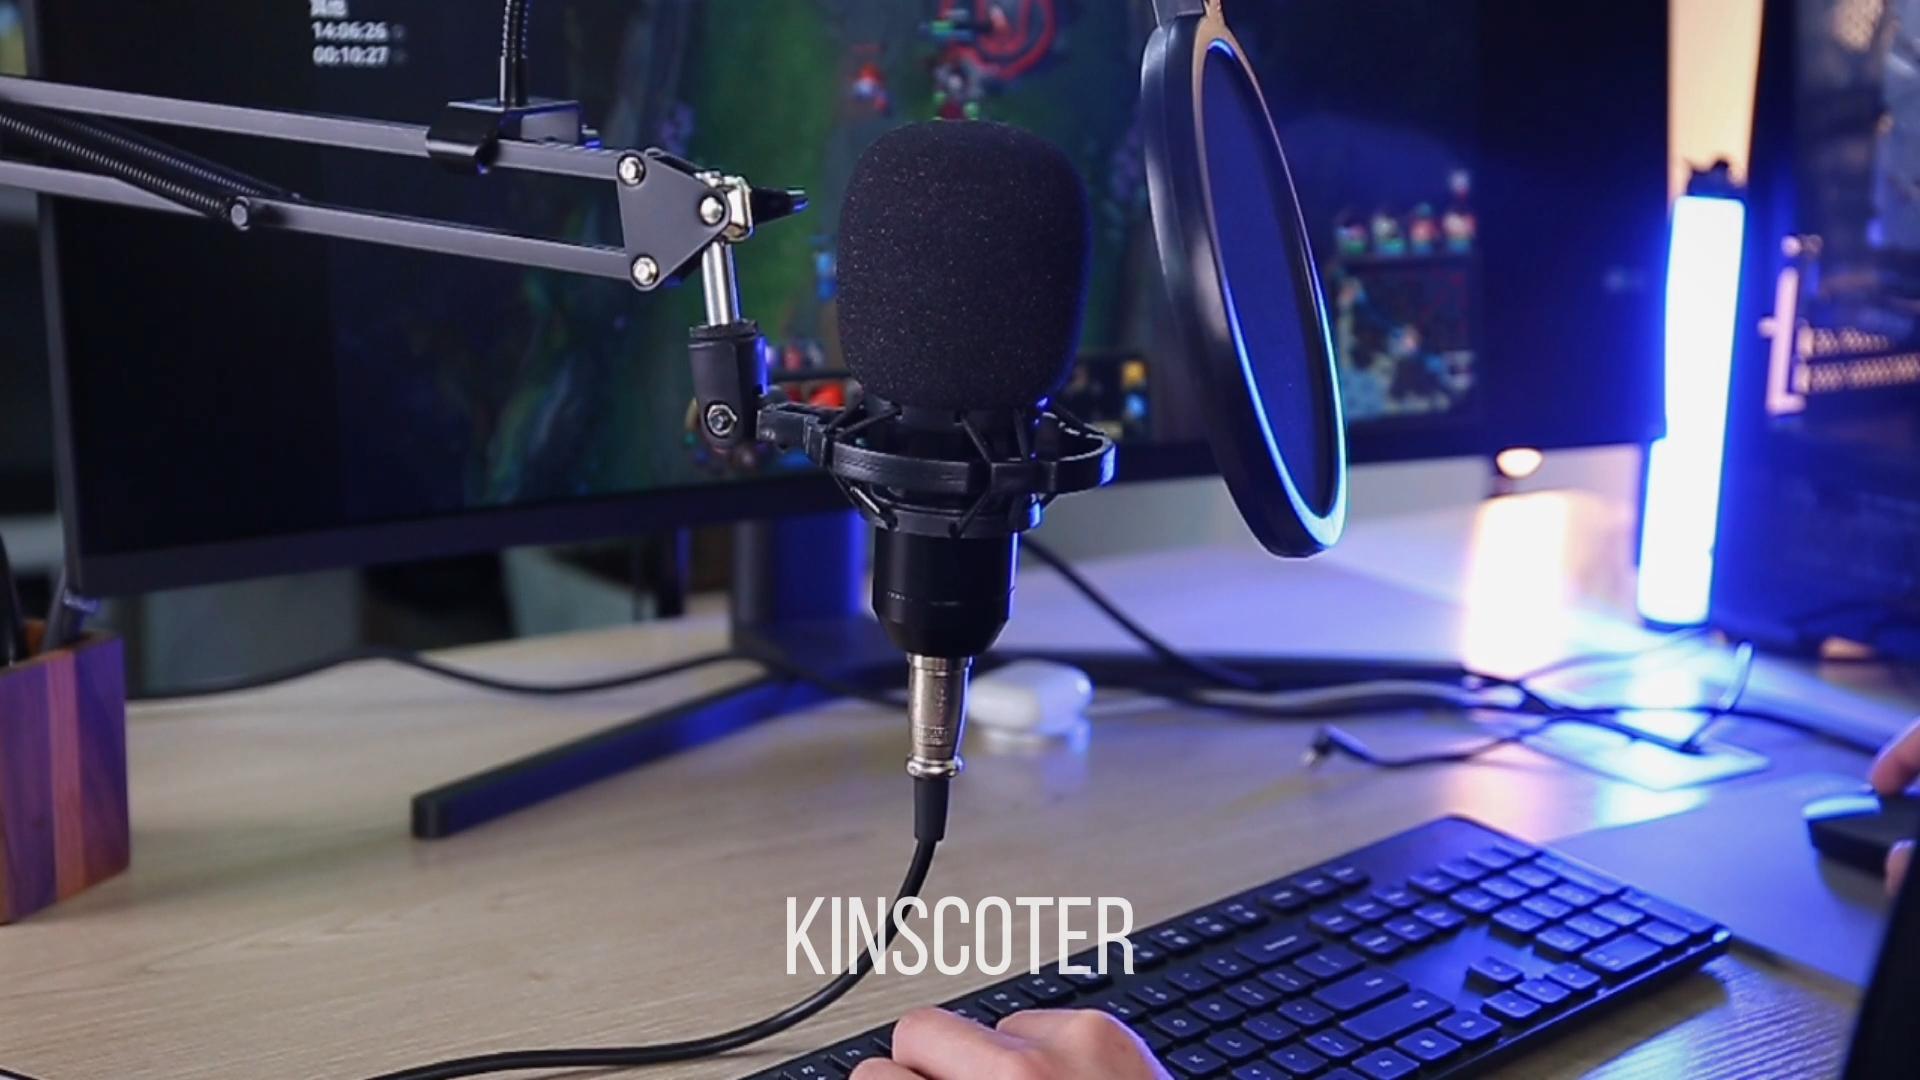 Katlanabilir mikrofon kondenser mikrofon Pro ses stüdyosu ses kayıt kol standı filtresi